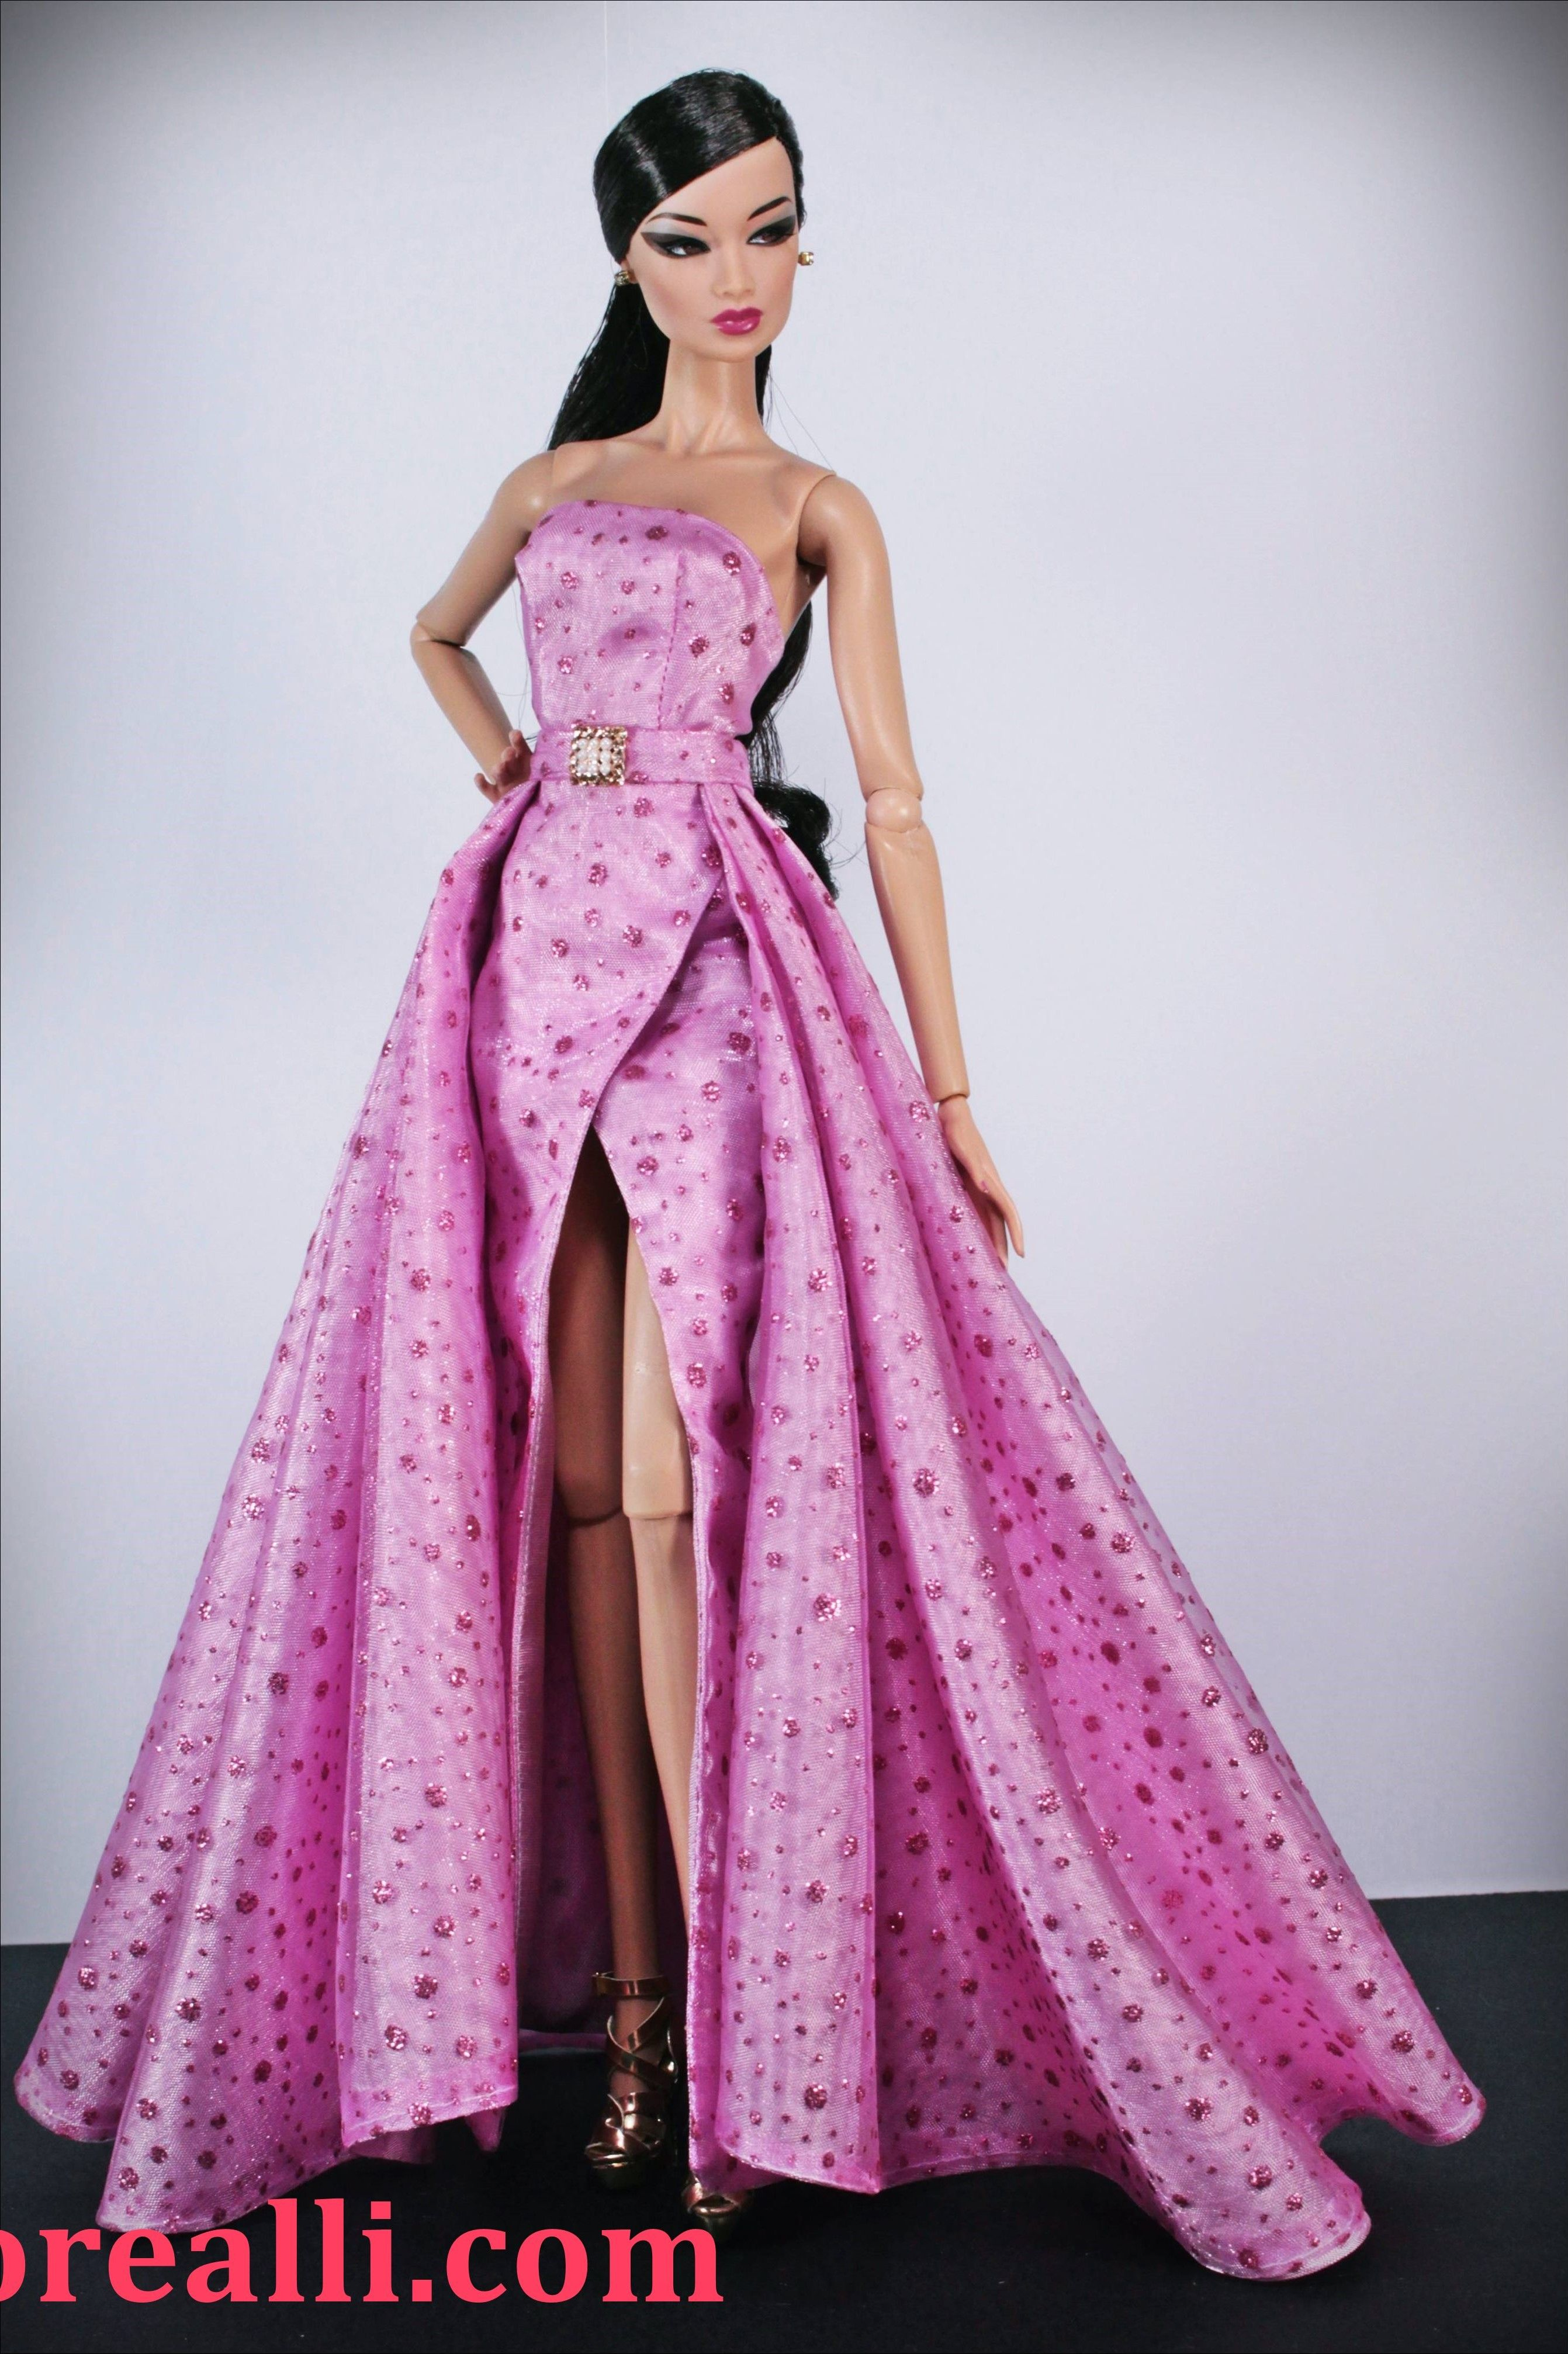 doll #formal #gowns / www.antoniorealli.com / 12.28.2 | Idea clothes ...